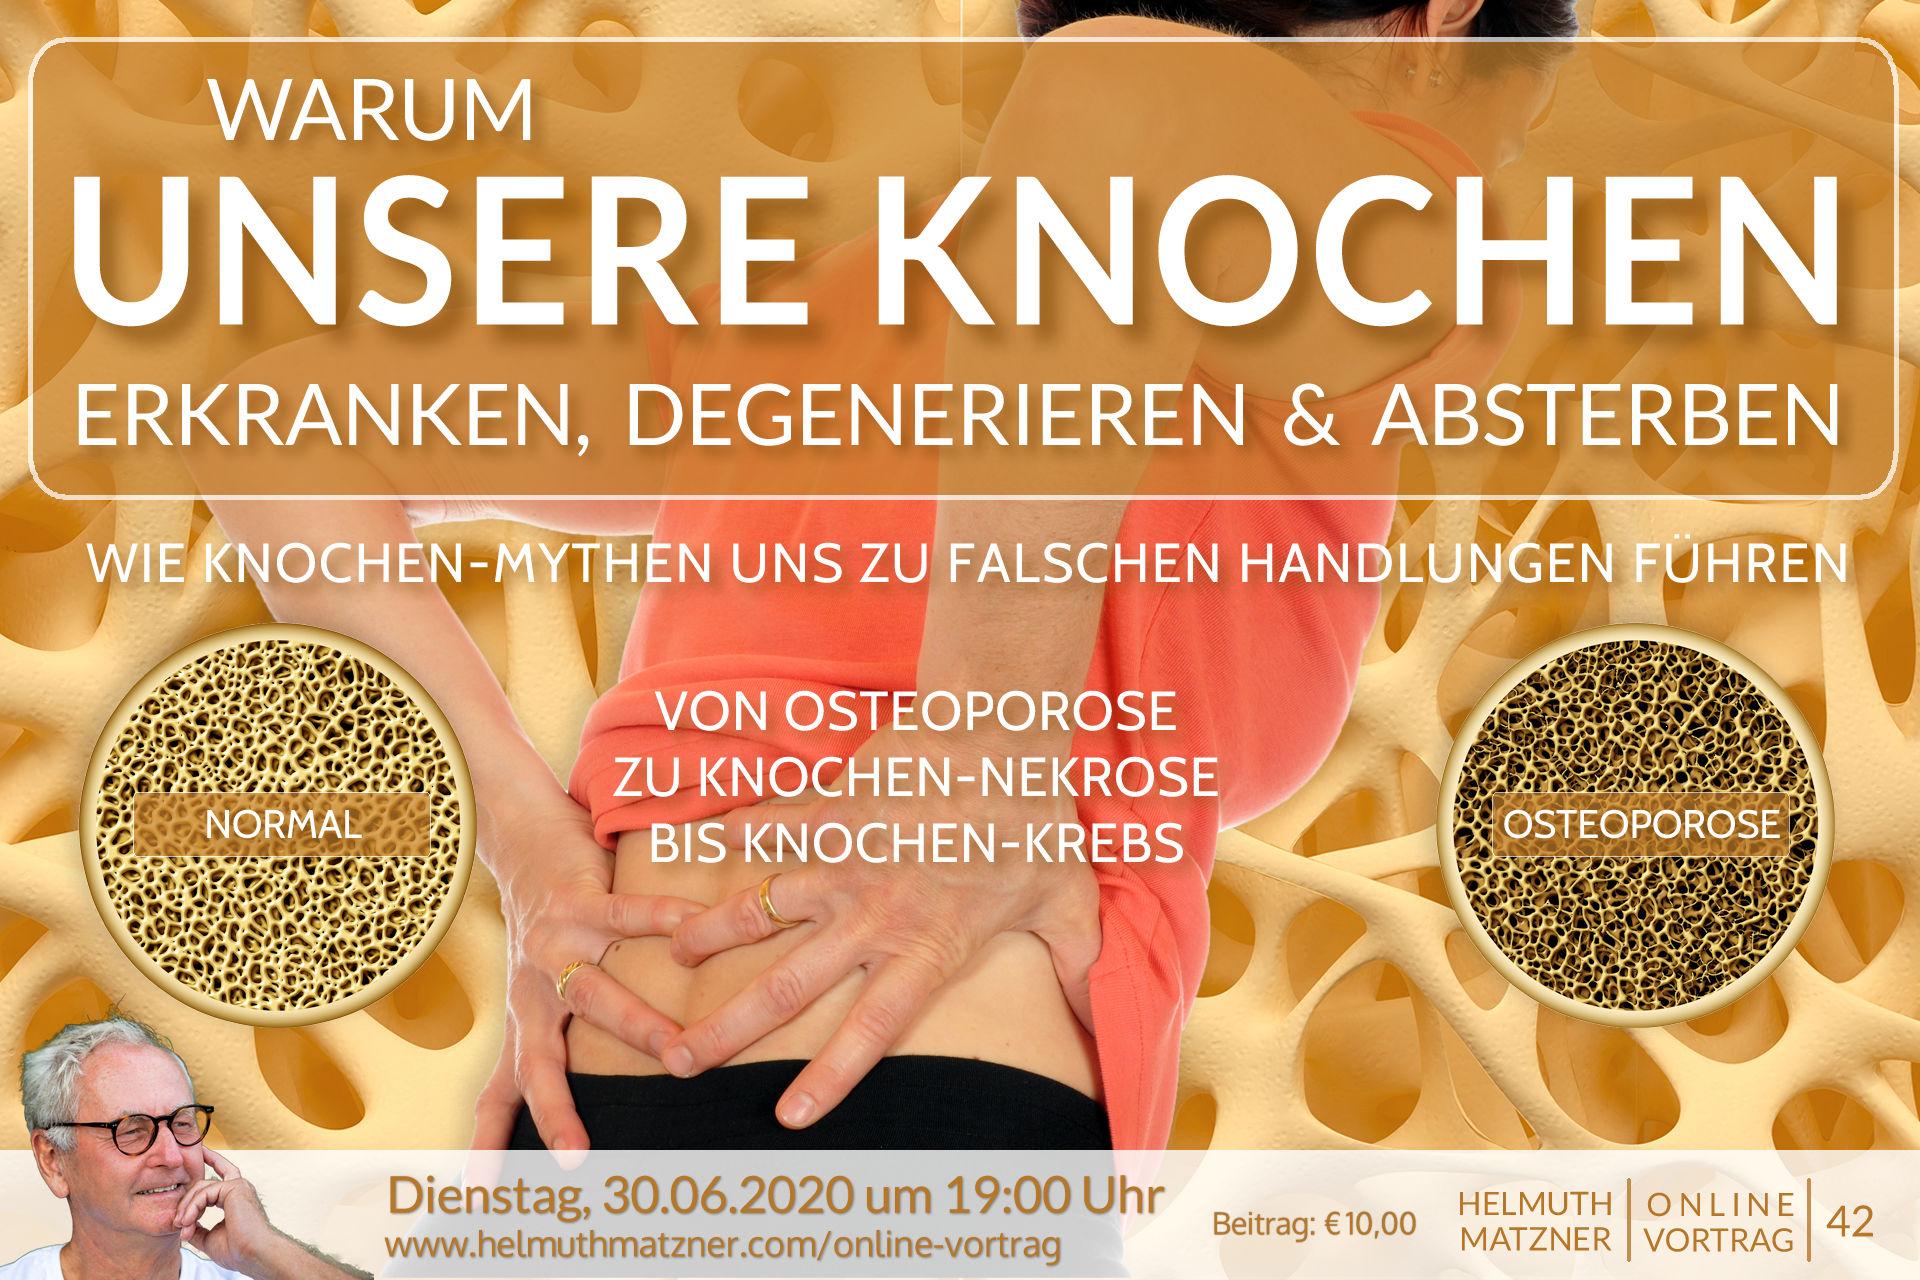 Helmuth Matzner - Online-Vortrag 42 - Knochen - Banner v1